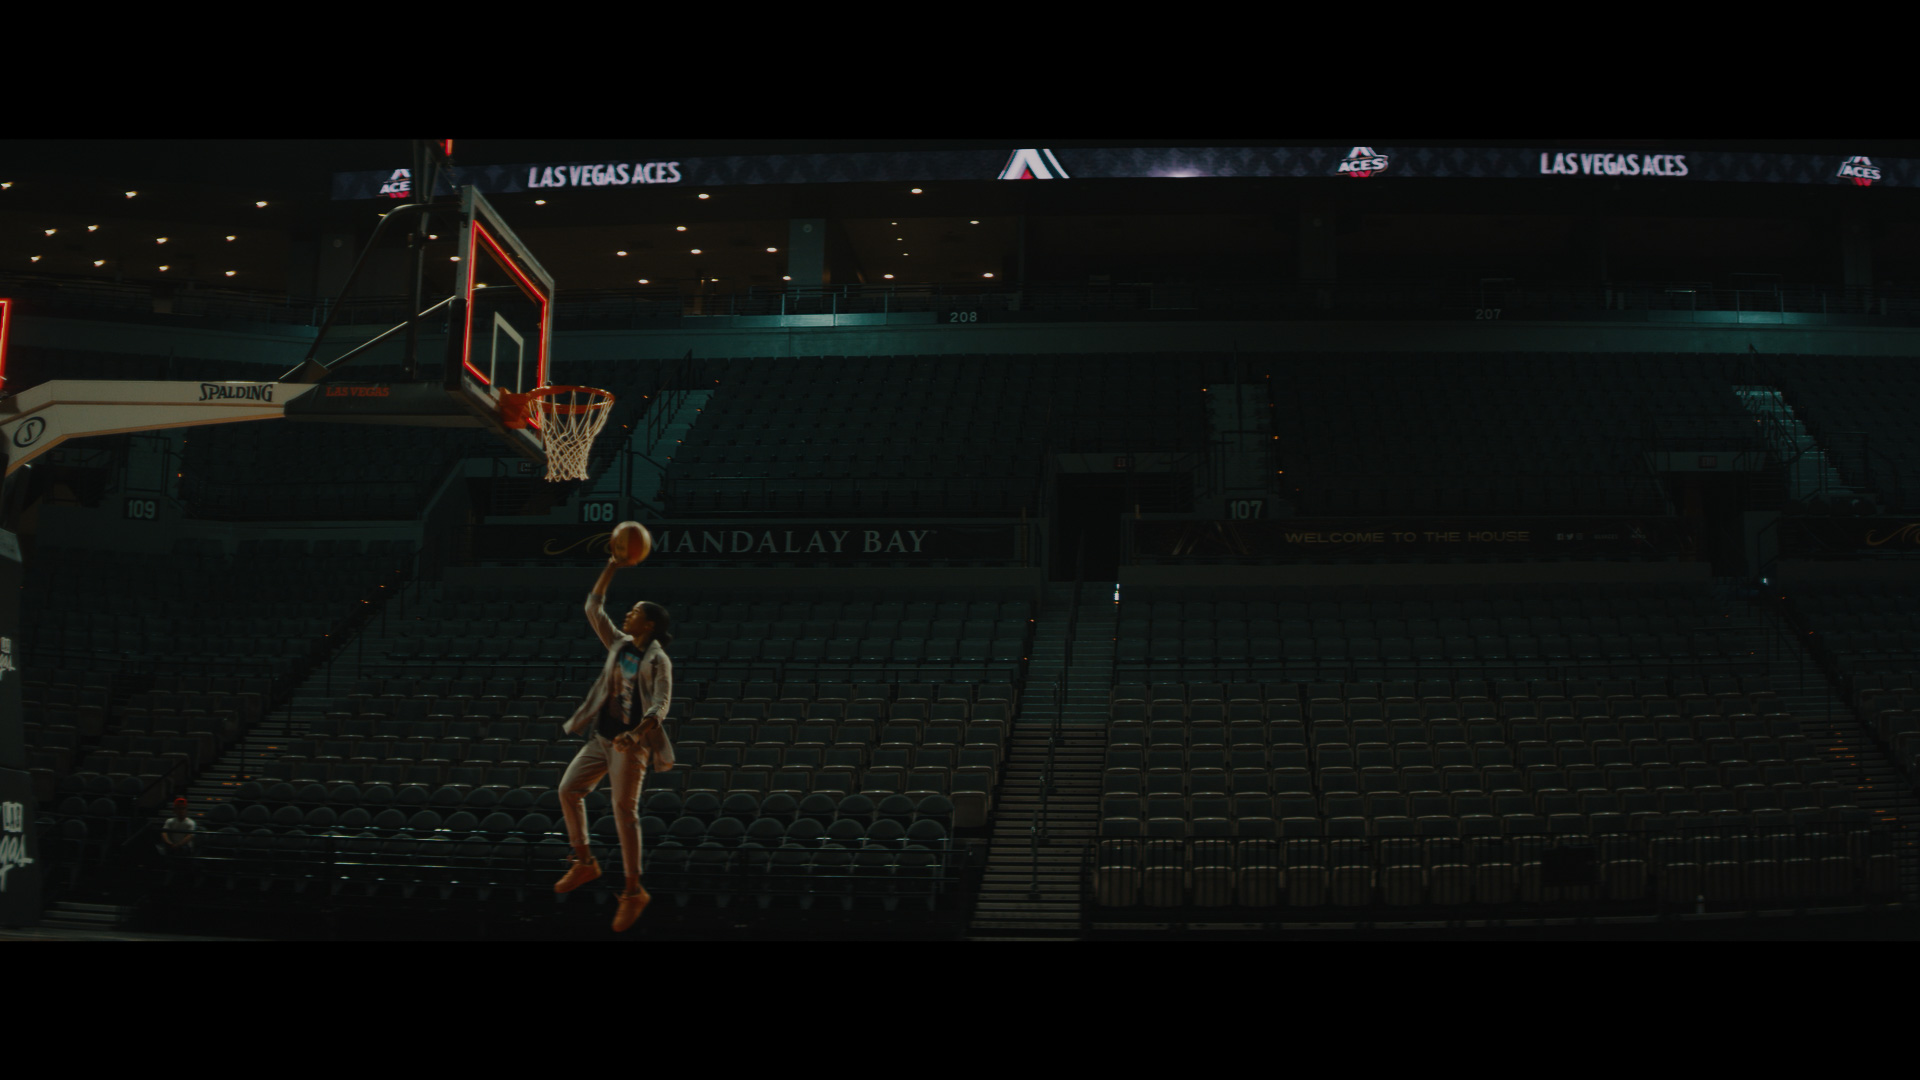 WNBA Las Vegas Compressed-44.jpg